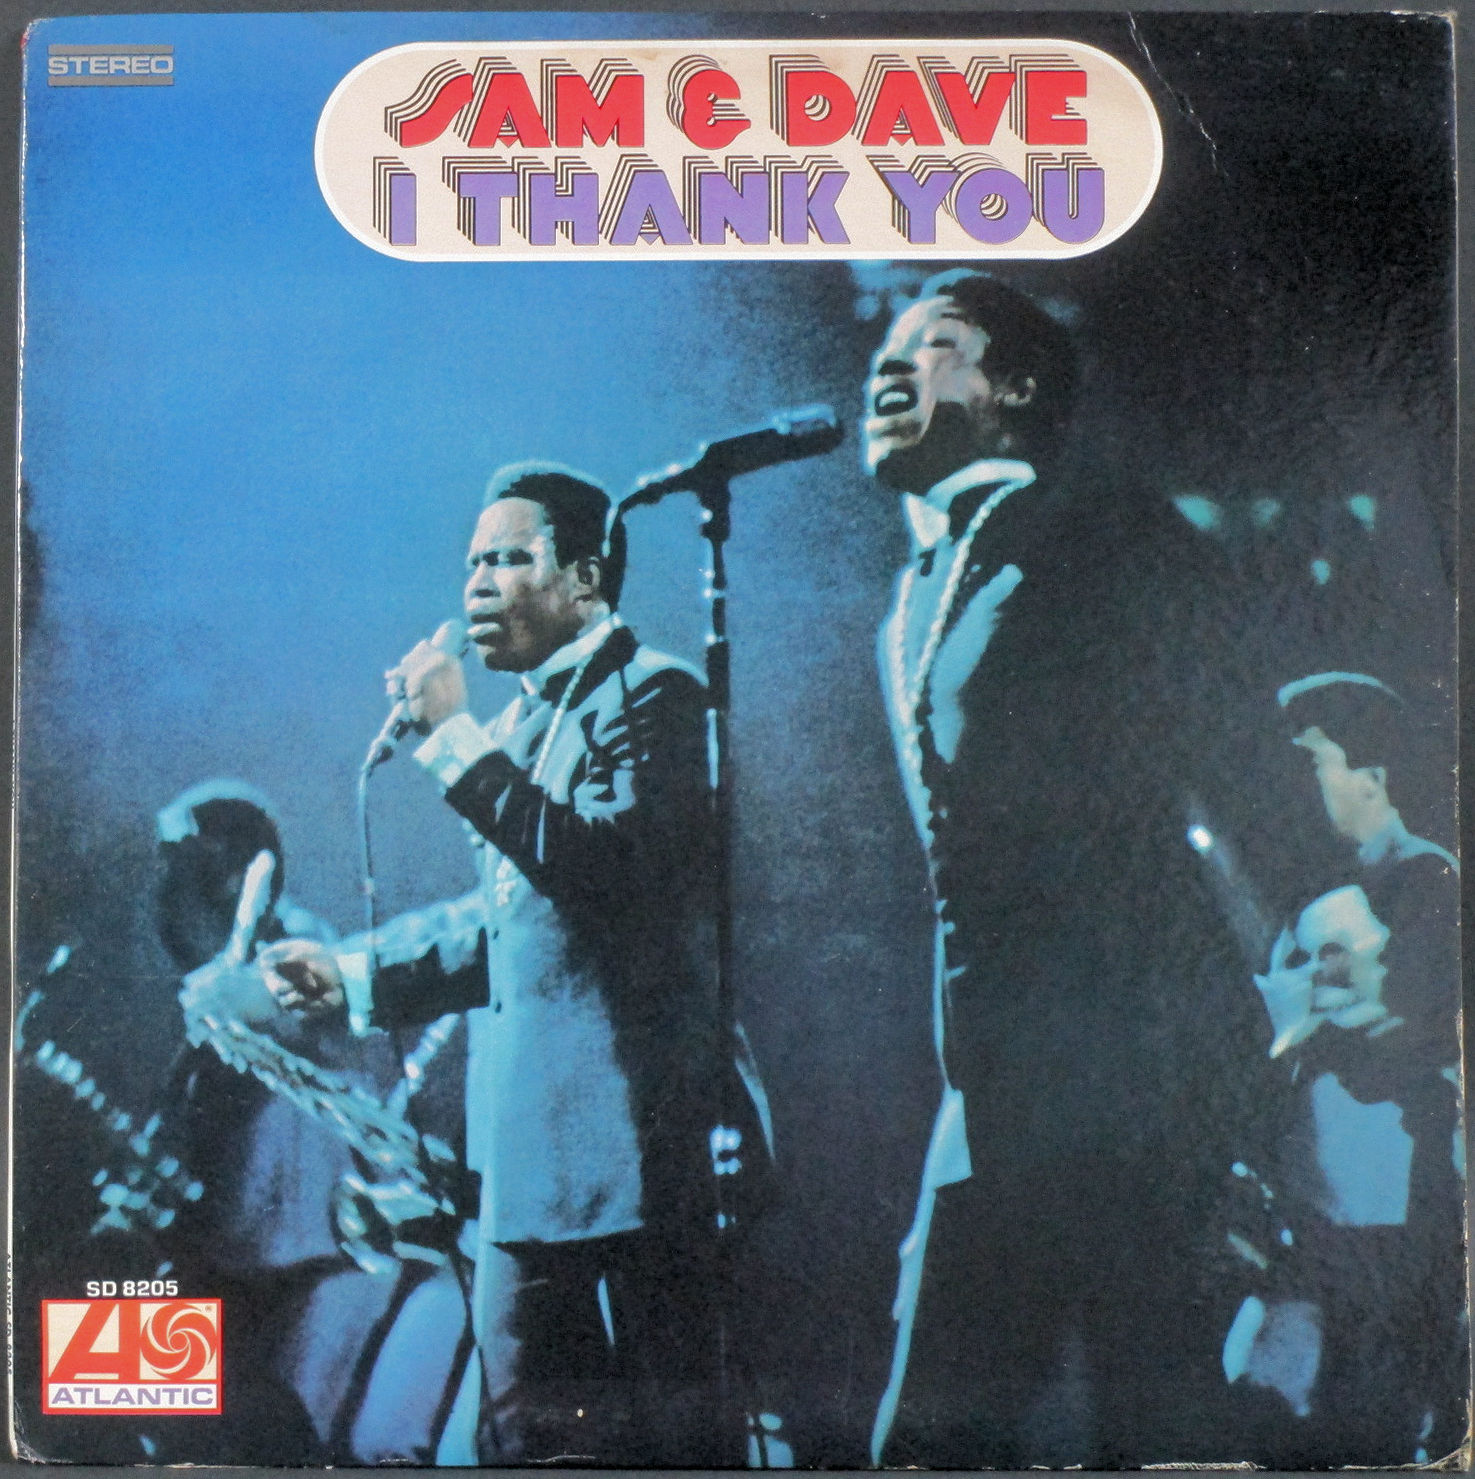 Sam & Dave サム・アンド・デイヴ / I Thank You アイ・サンキュー